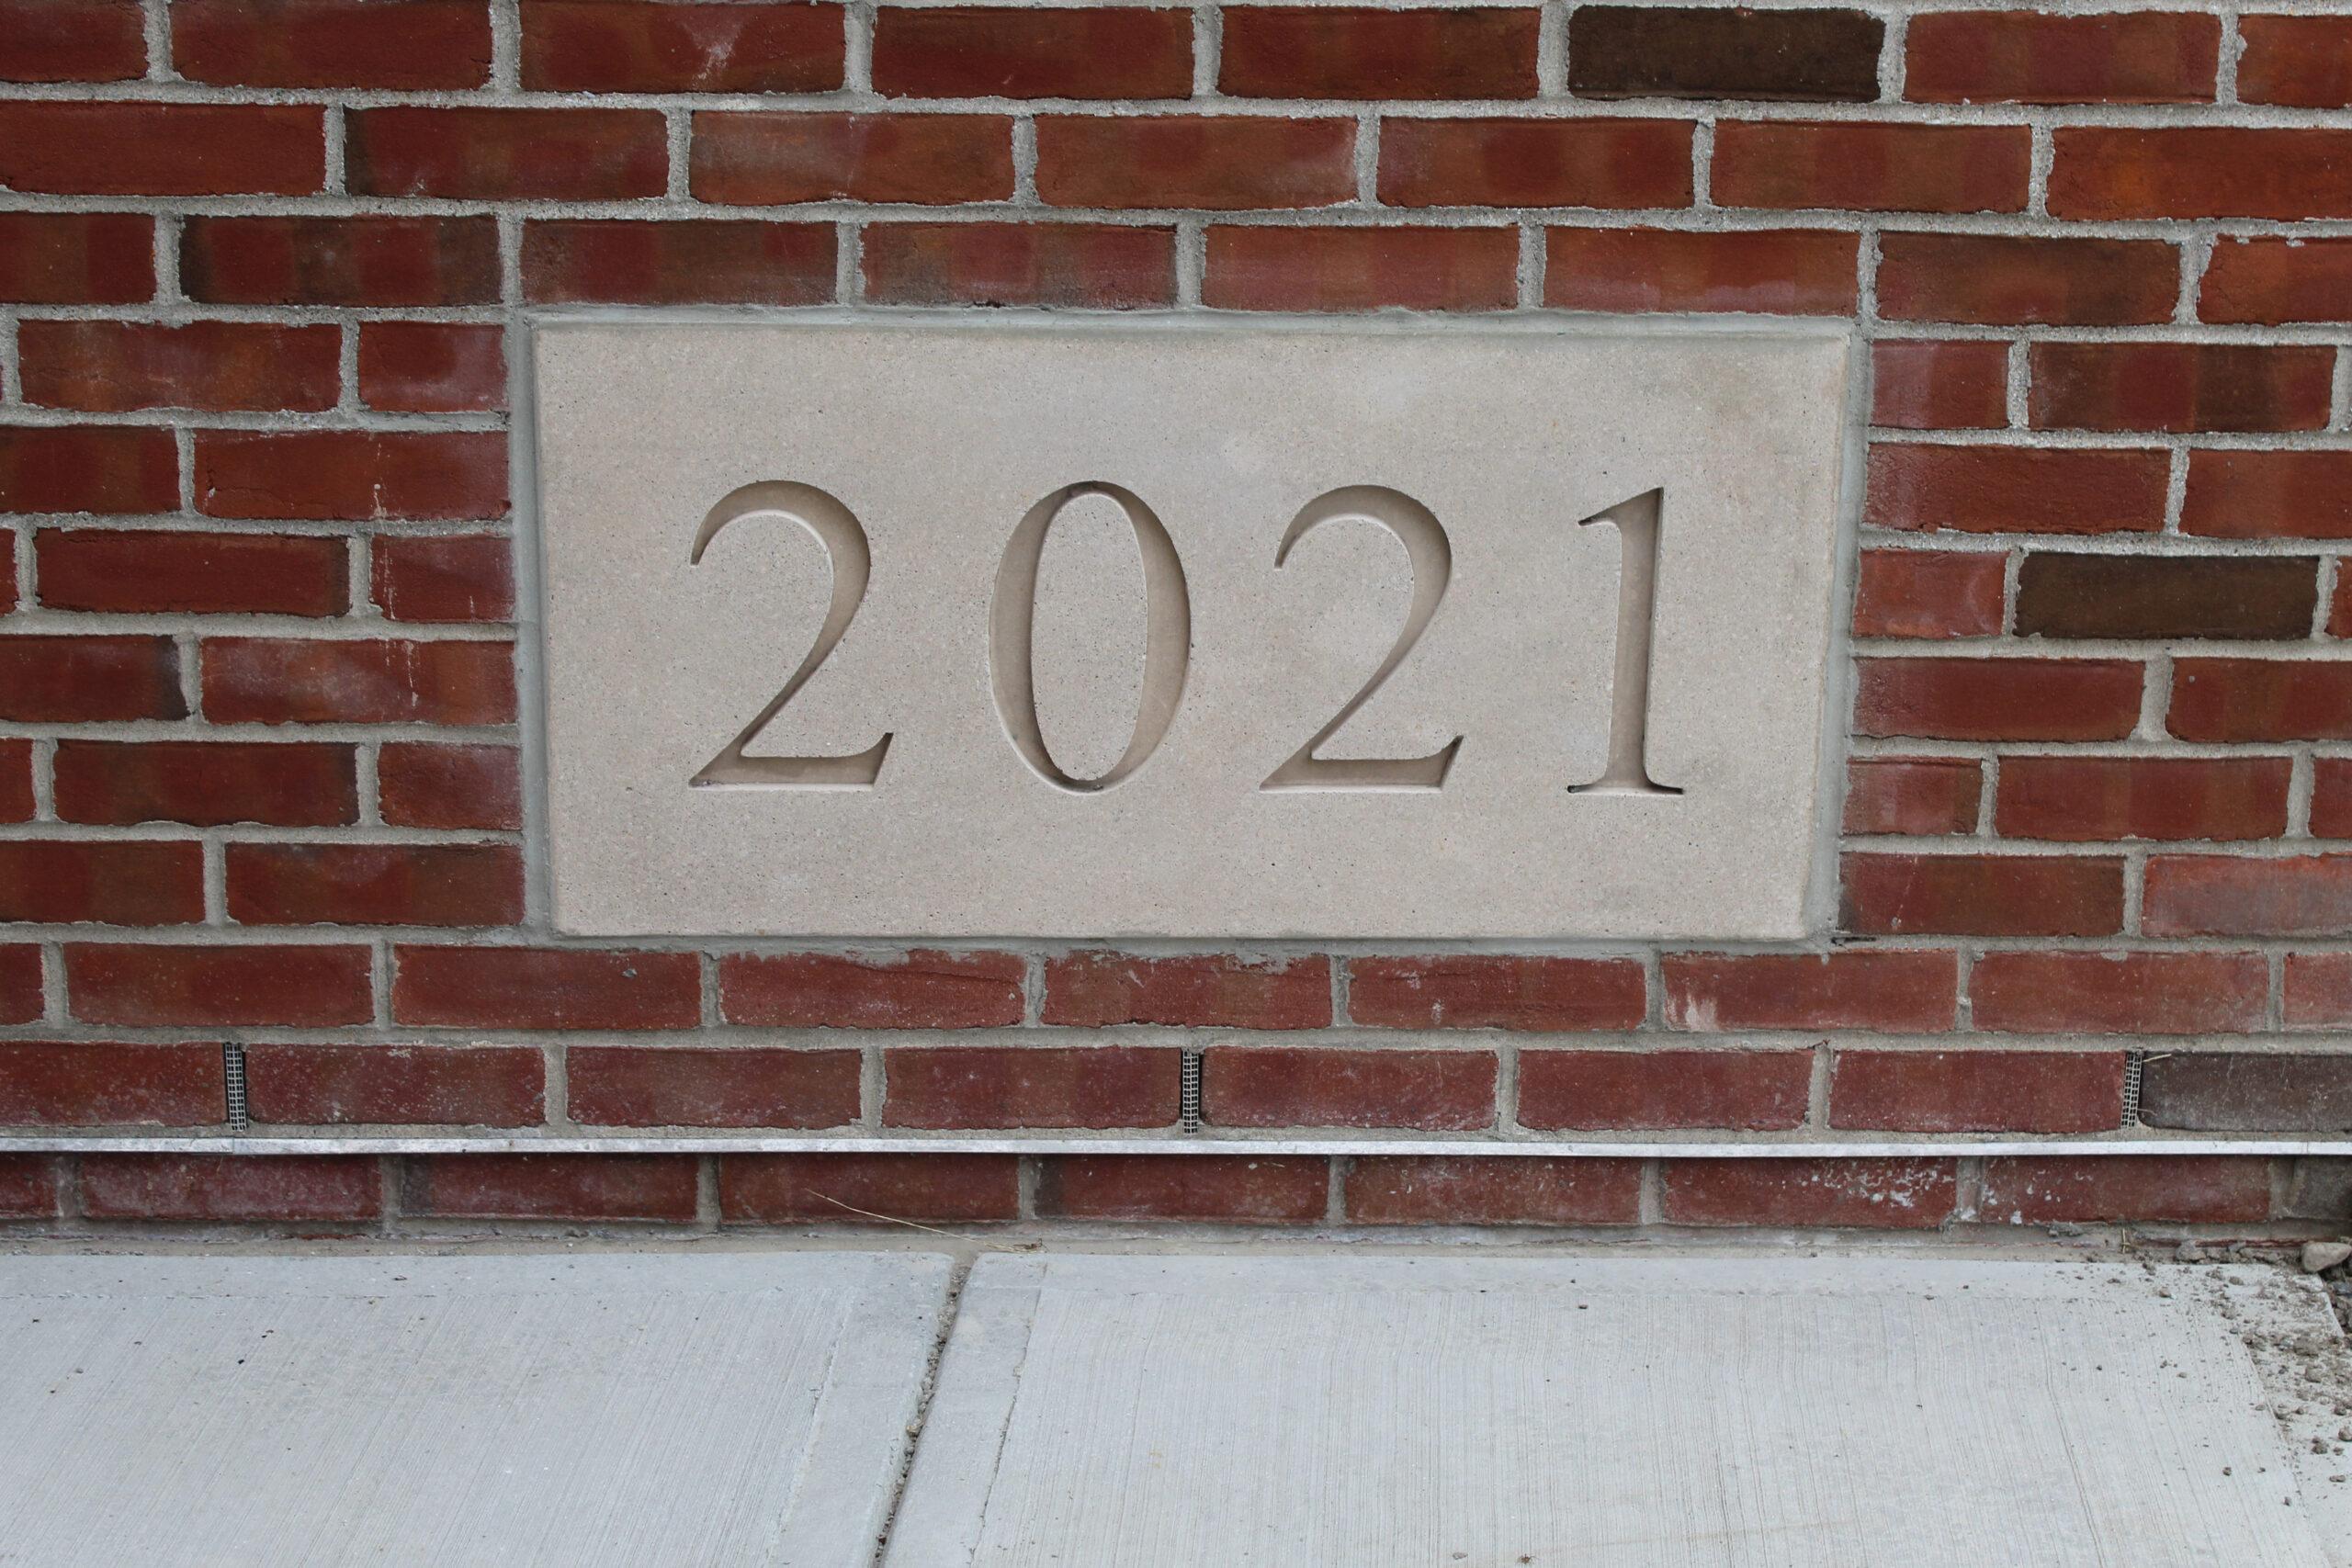 2021 datestone